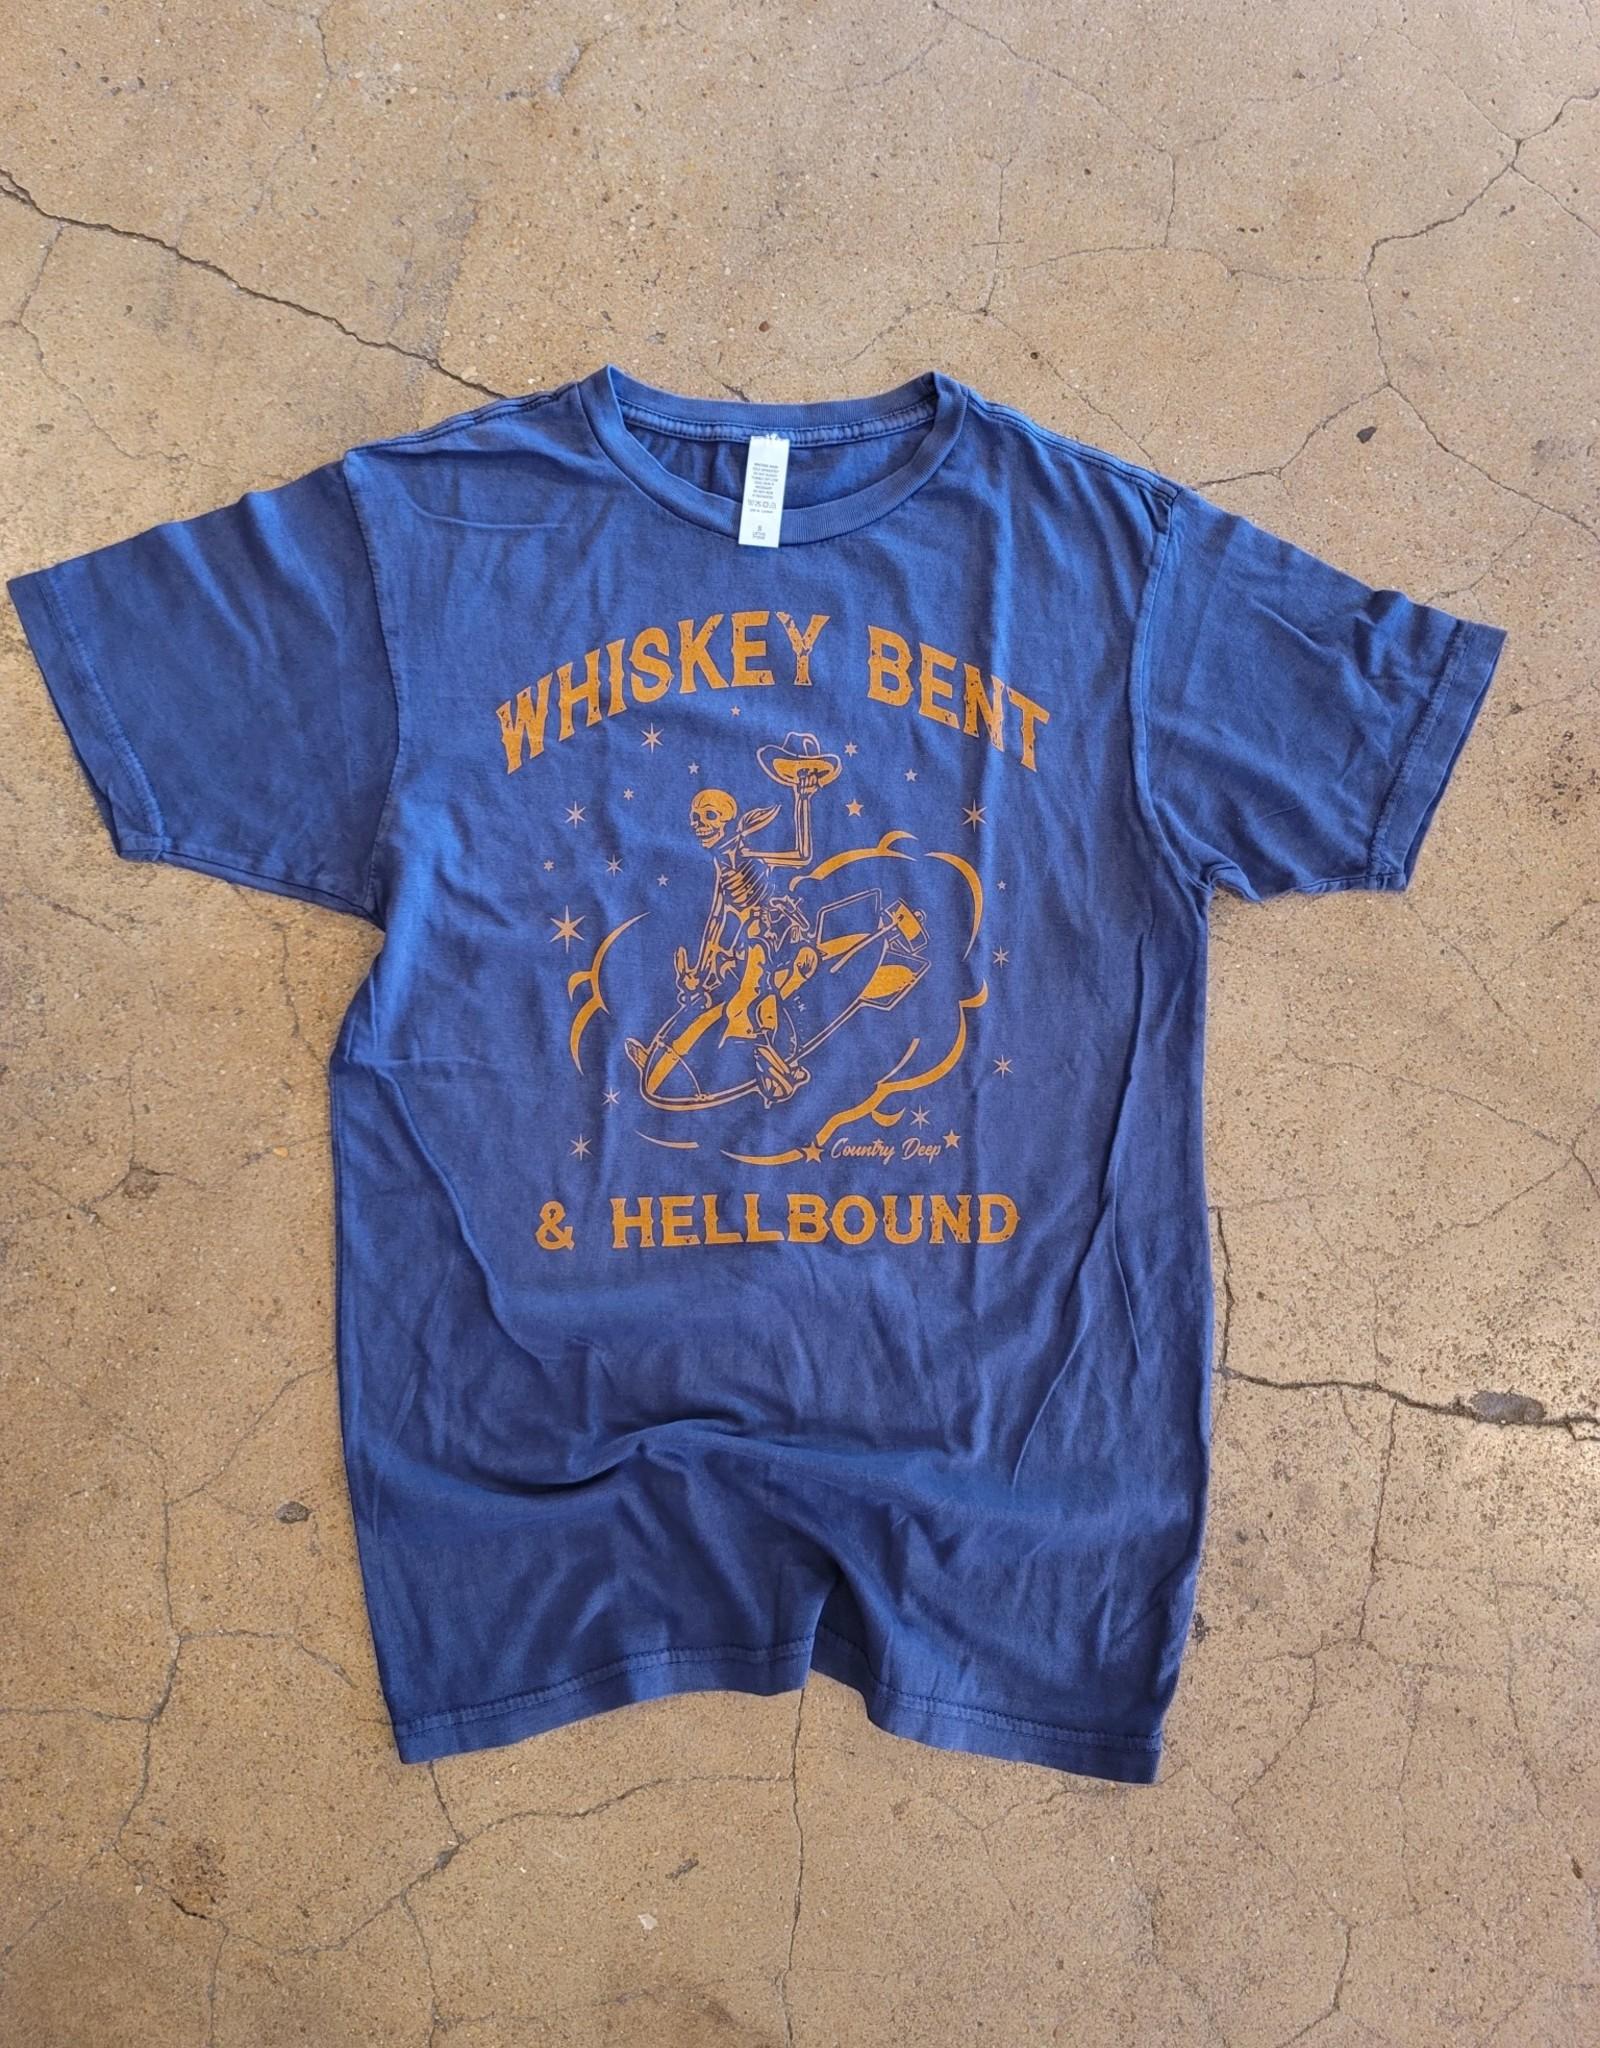 Whiskey Bent & Hellbound Tee